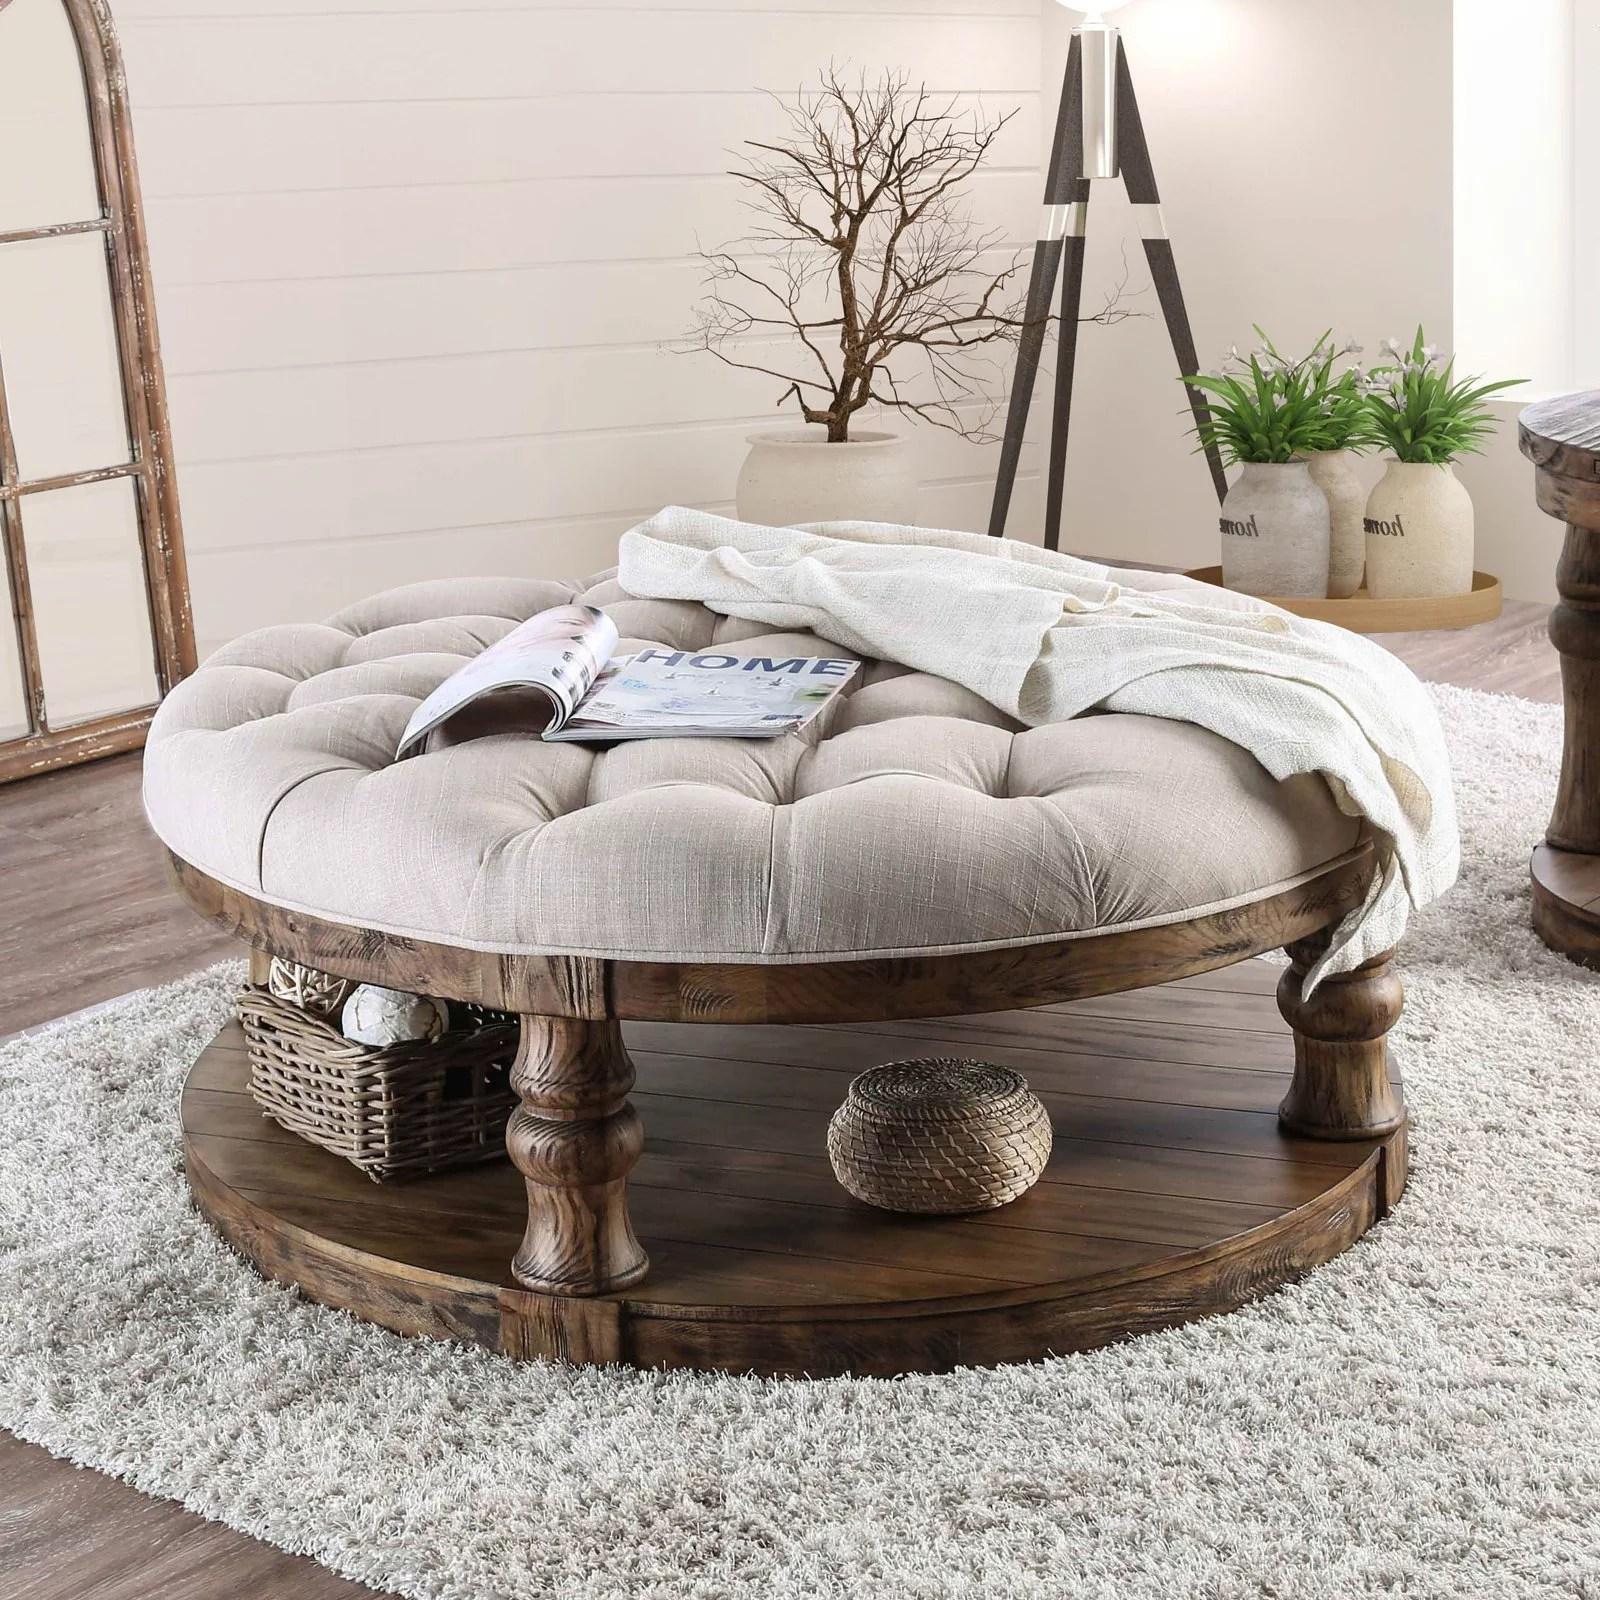 furniture of america tanenbaum rustic round coffee table ottoman